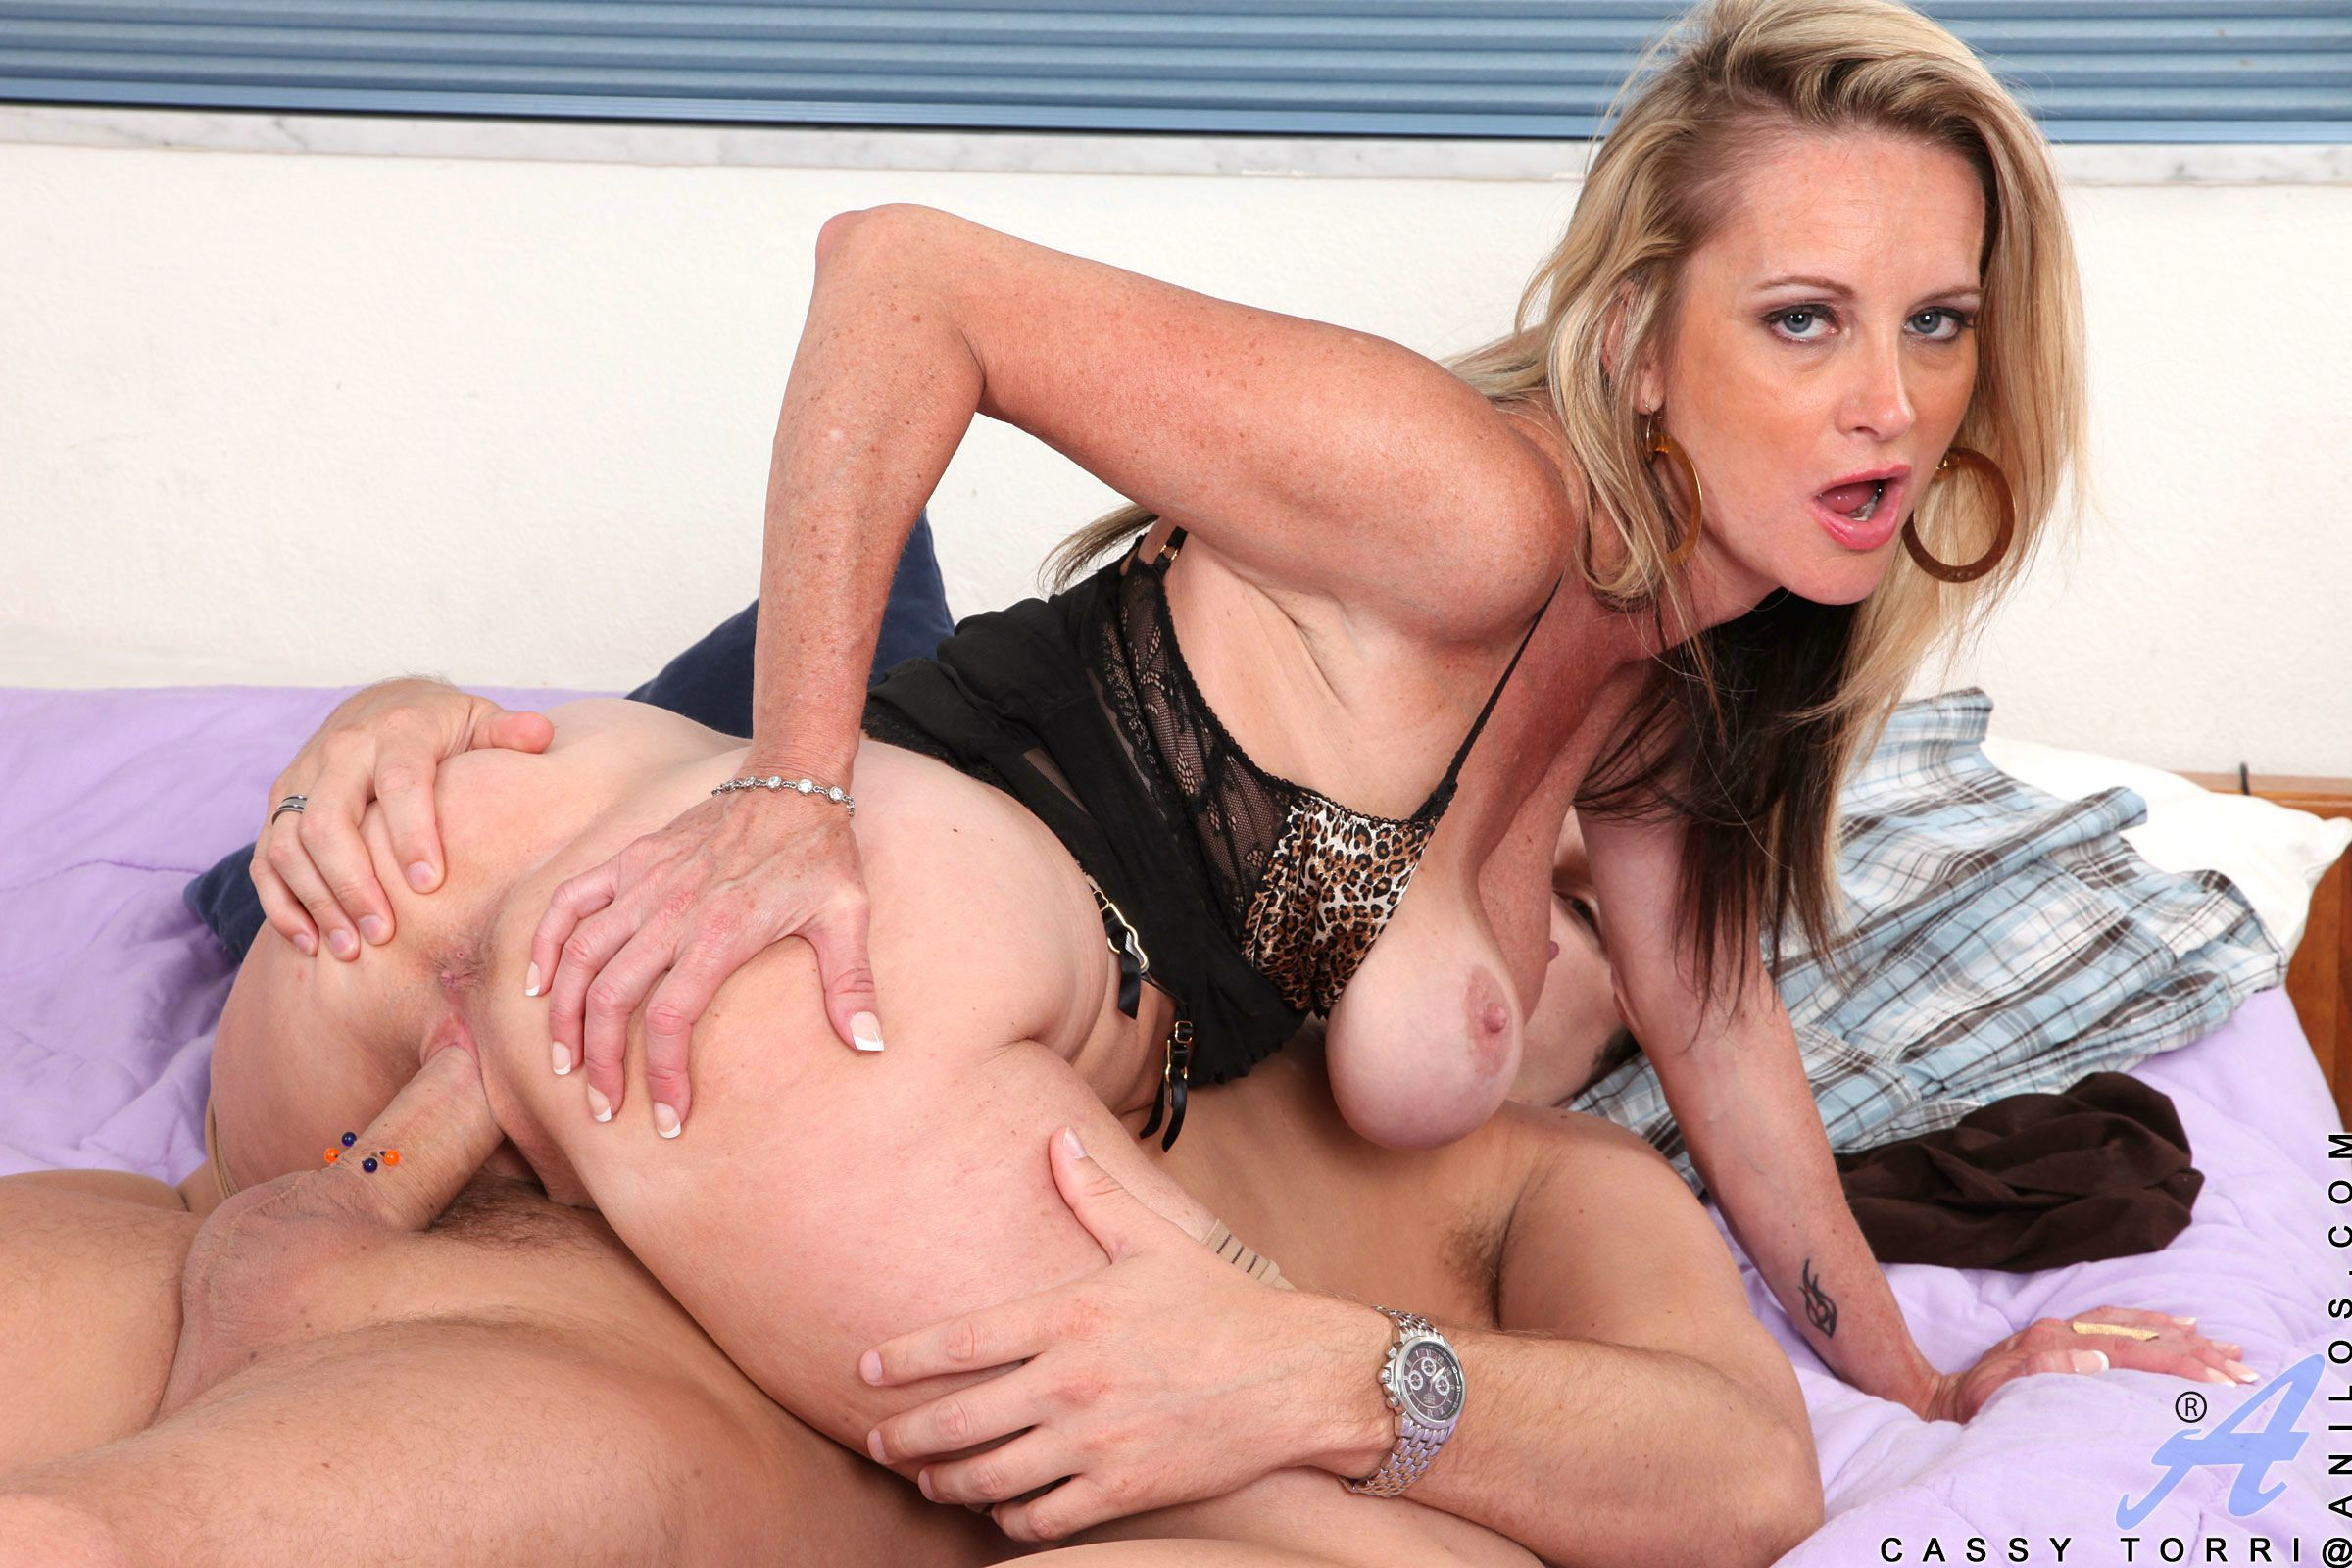 Chubbyloving torri grouporgy bbw mistress gifs xxx porn pics